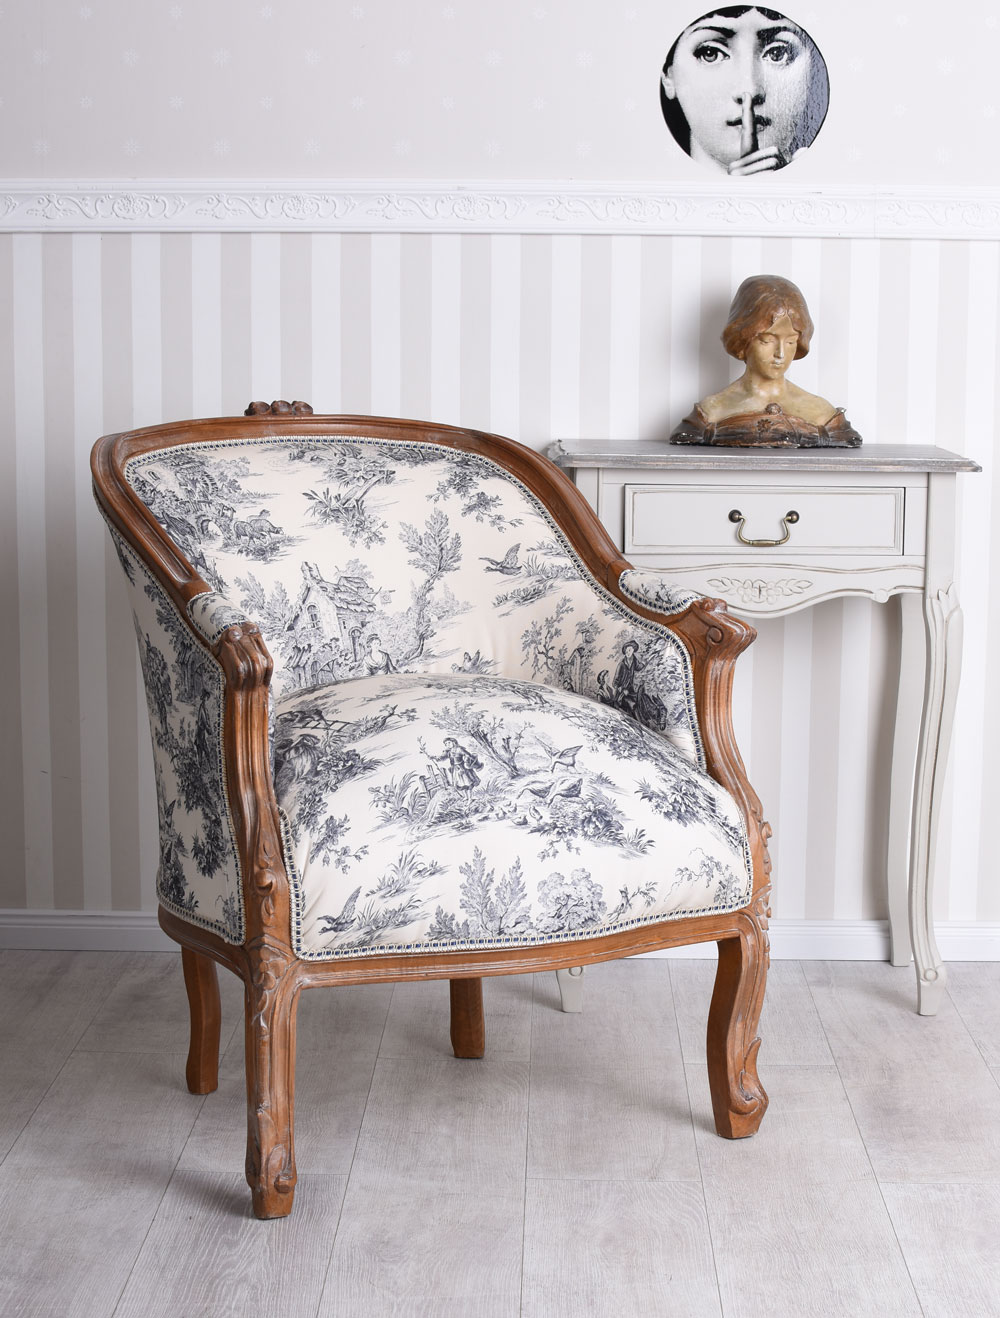 Französischer Sessel Antik Barockstuhl toile de jouy Ohrensessel Polstersessel